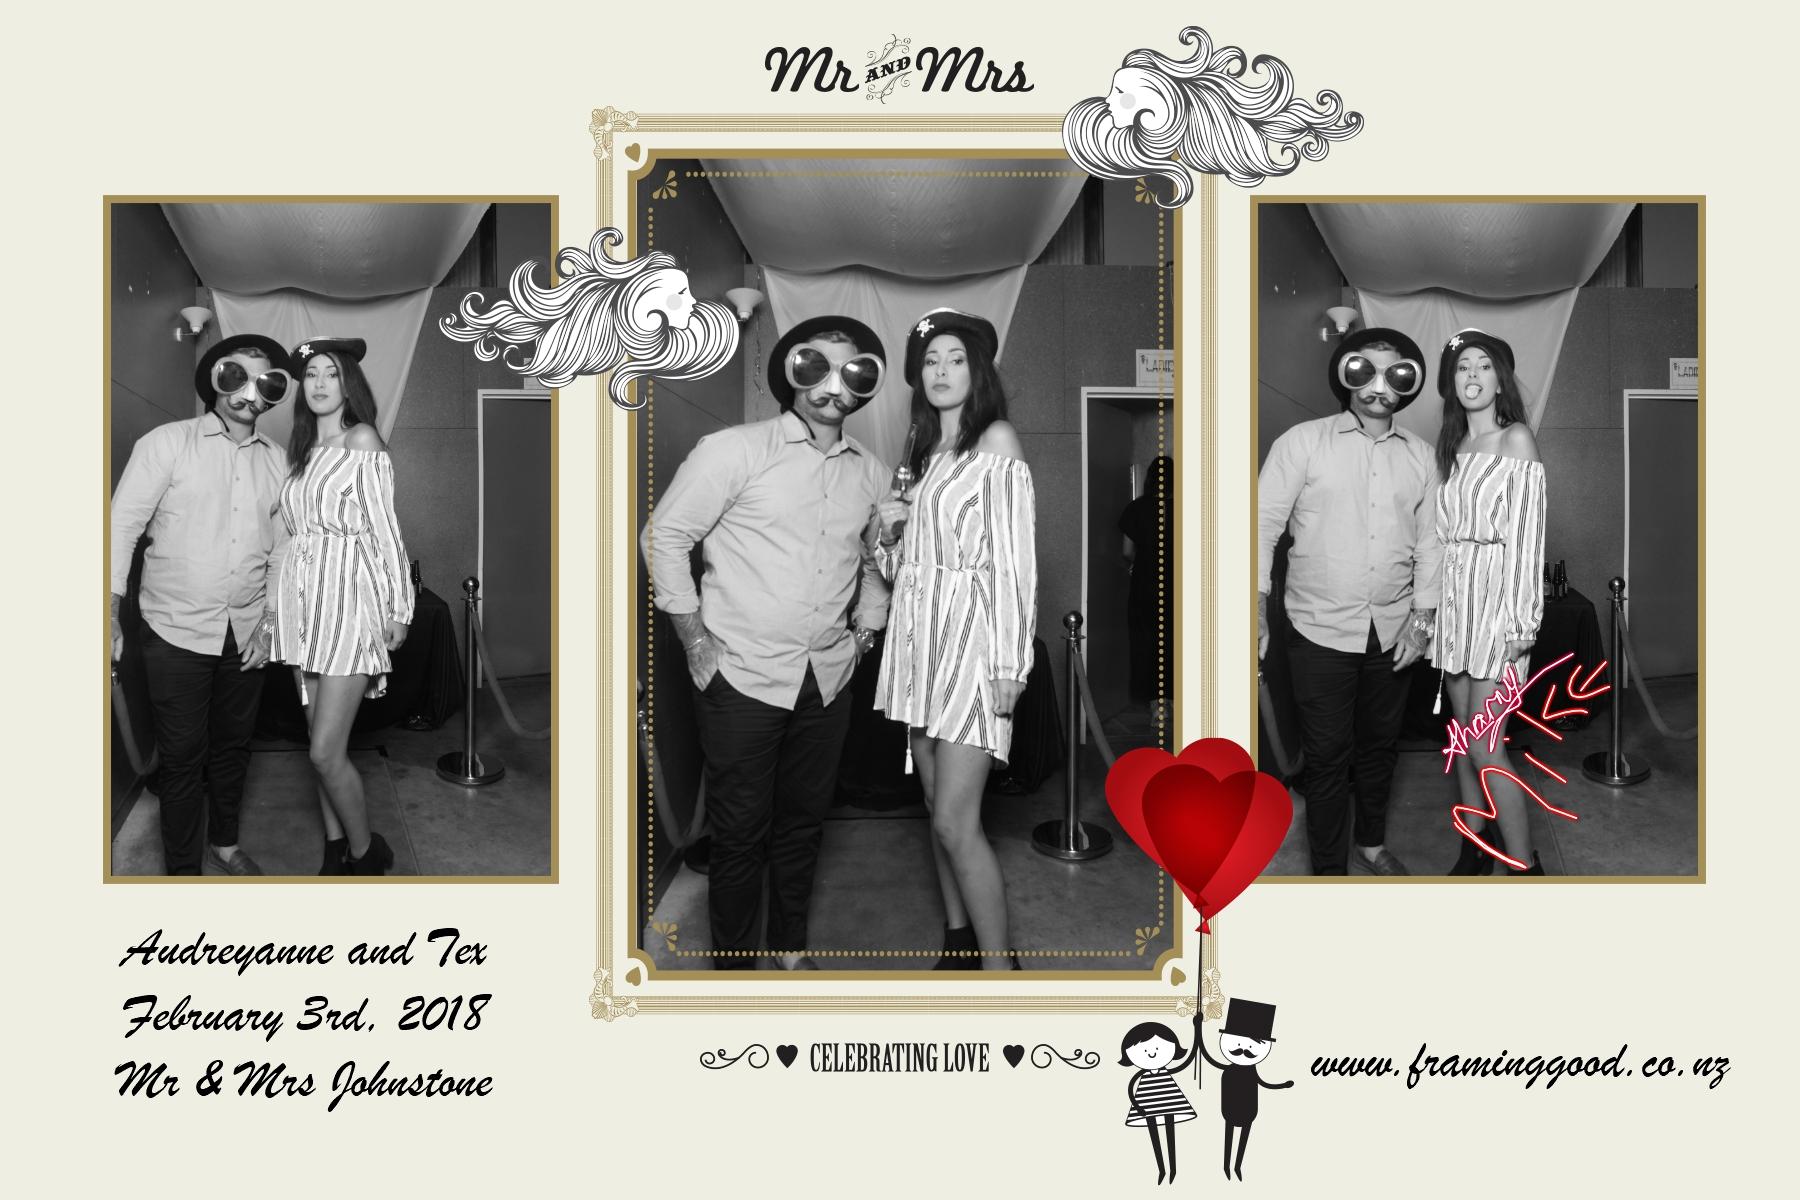 Framing Good Photo Booth_Wedding_Mirror Me.jpg